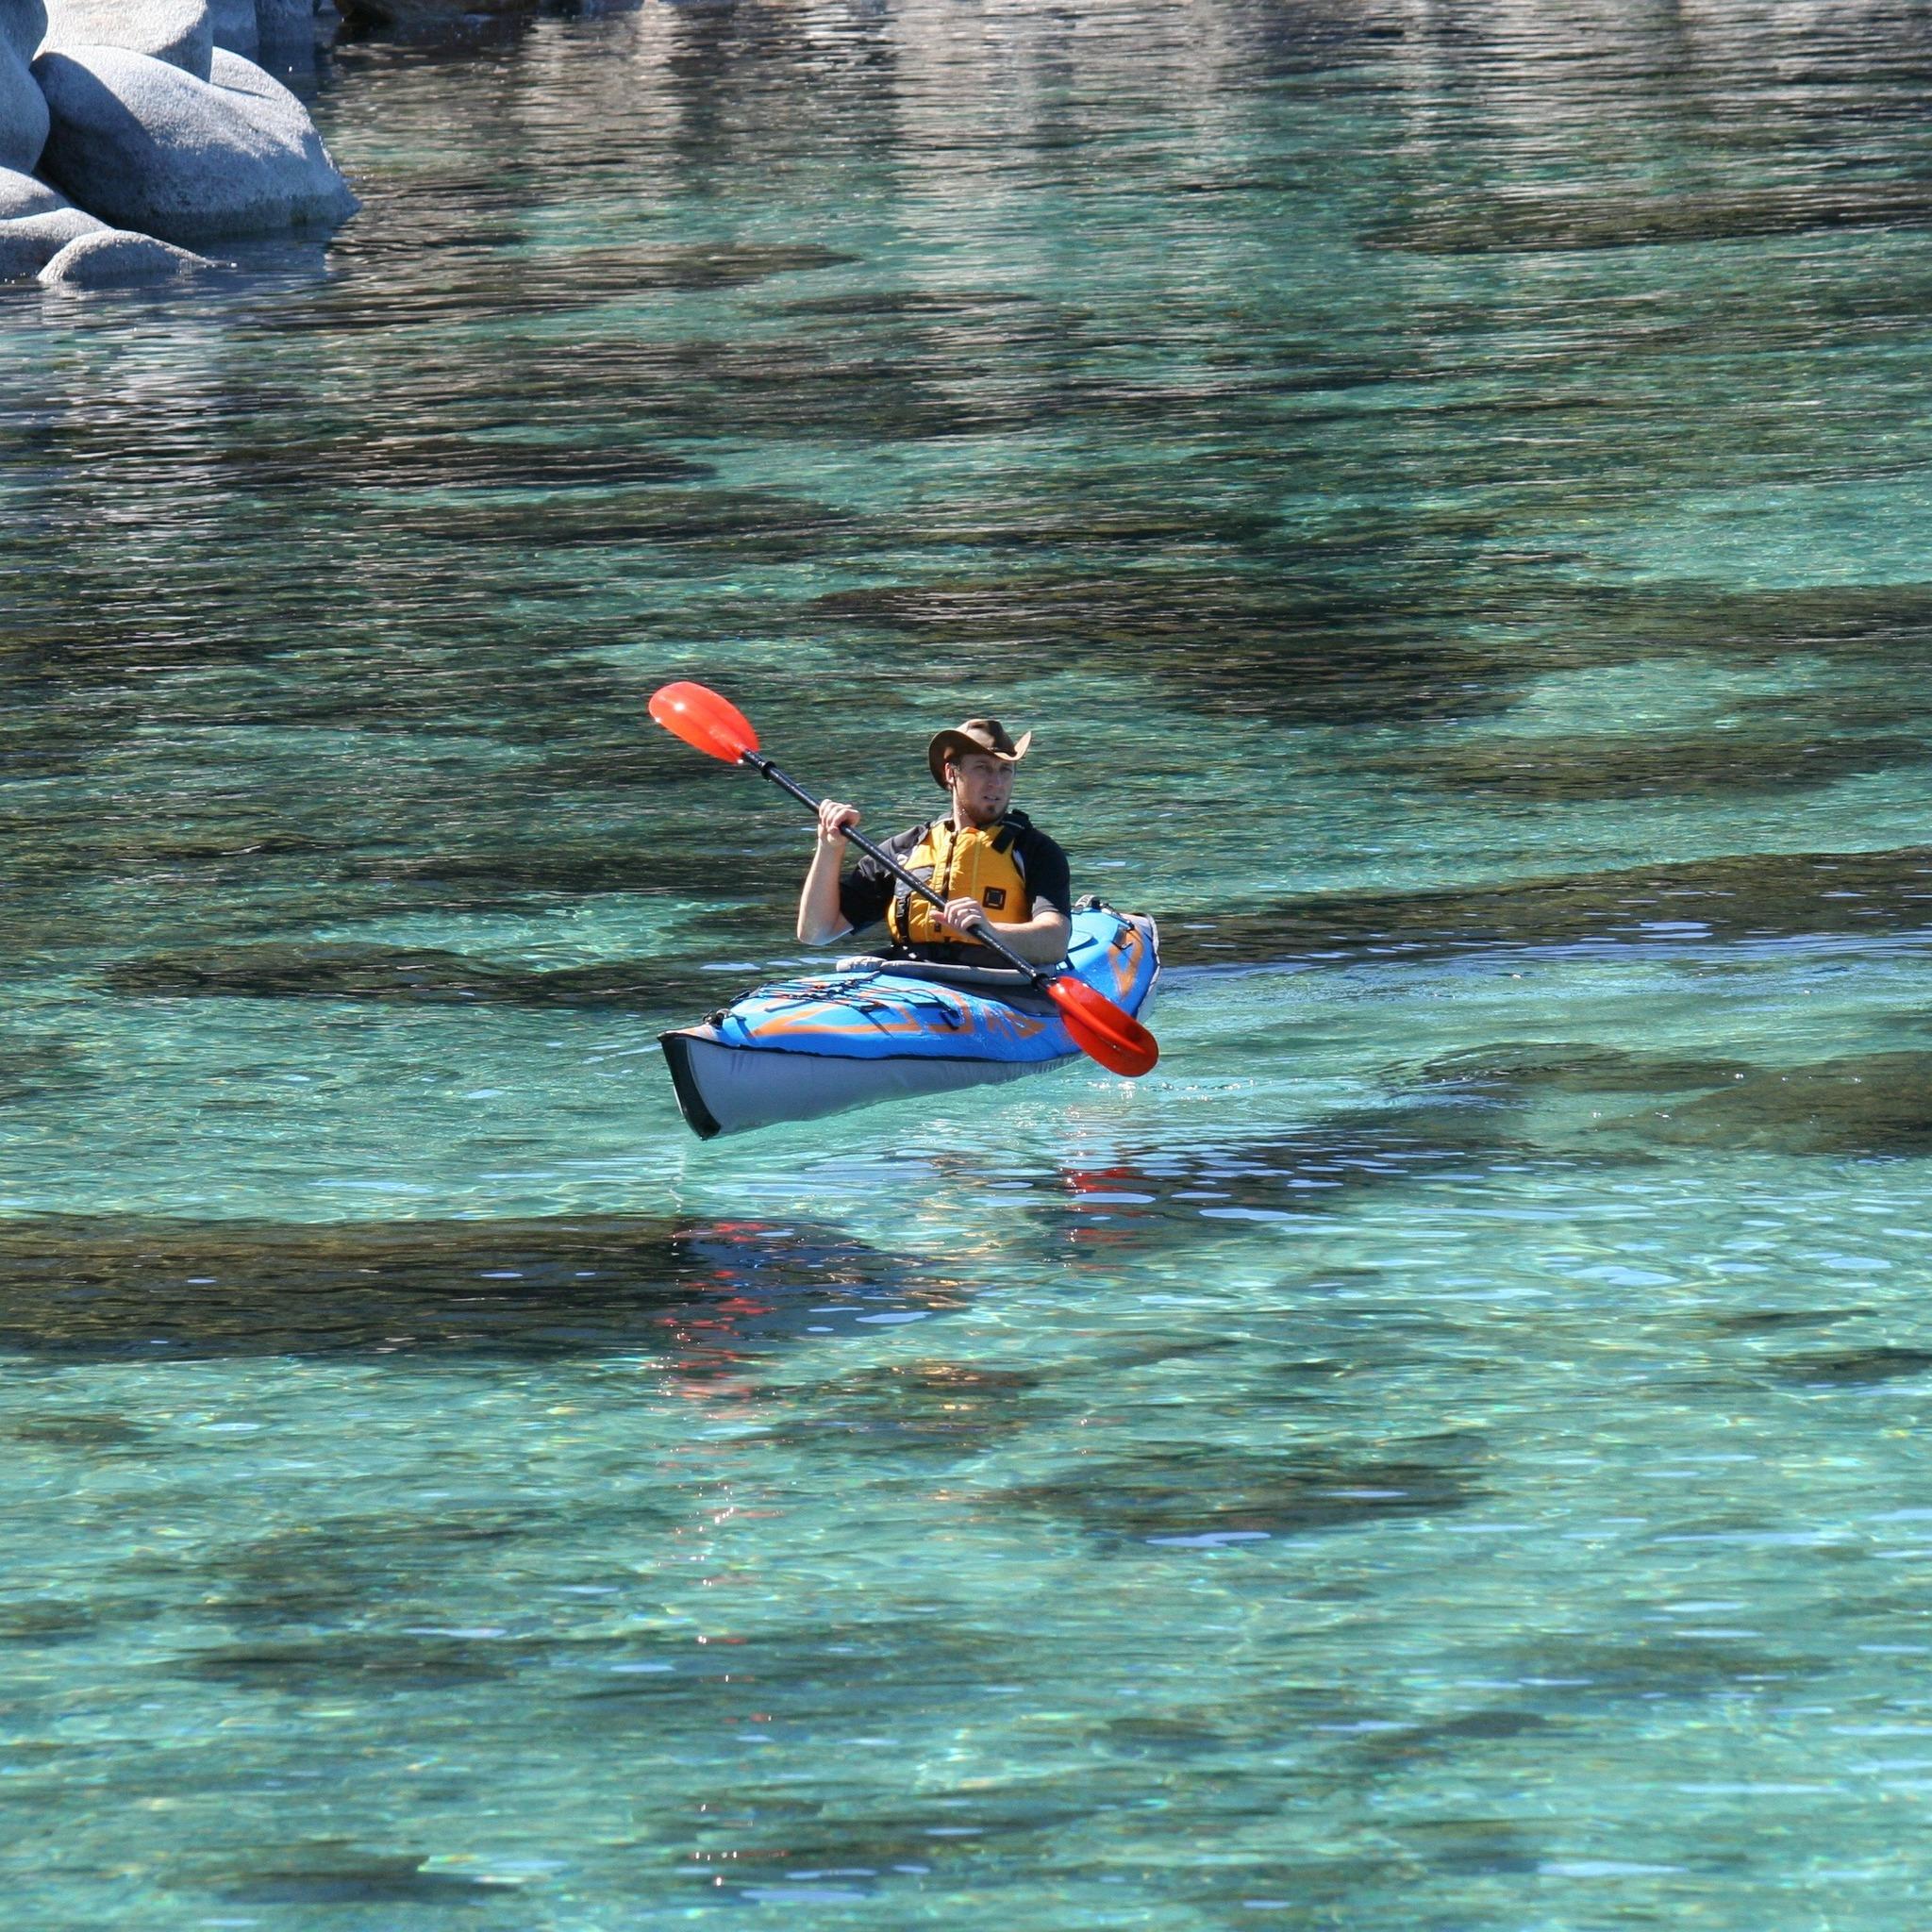 Expedition Elite inflatable kayak, single